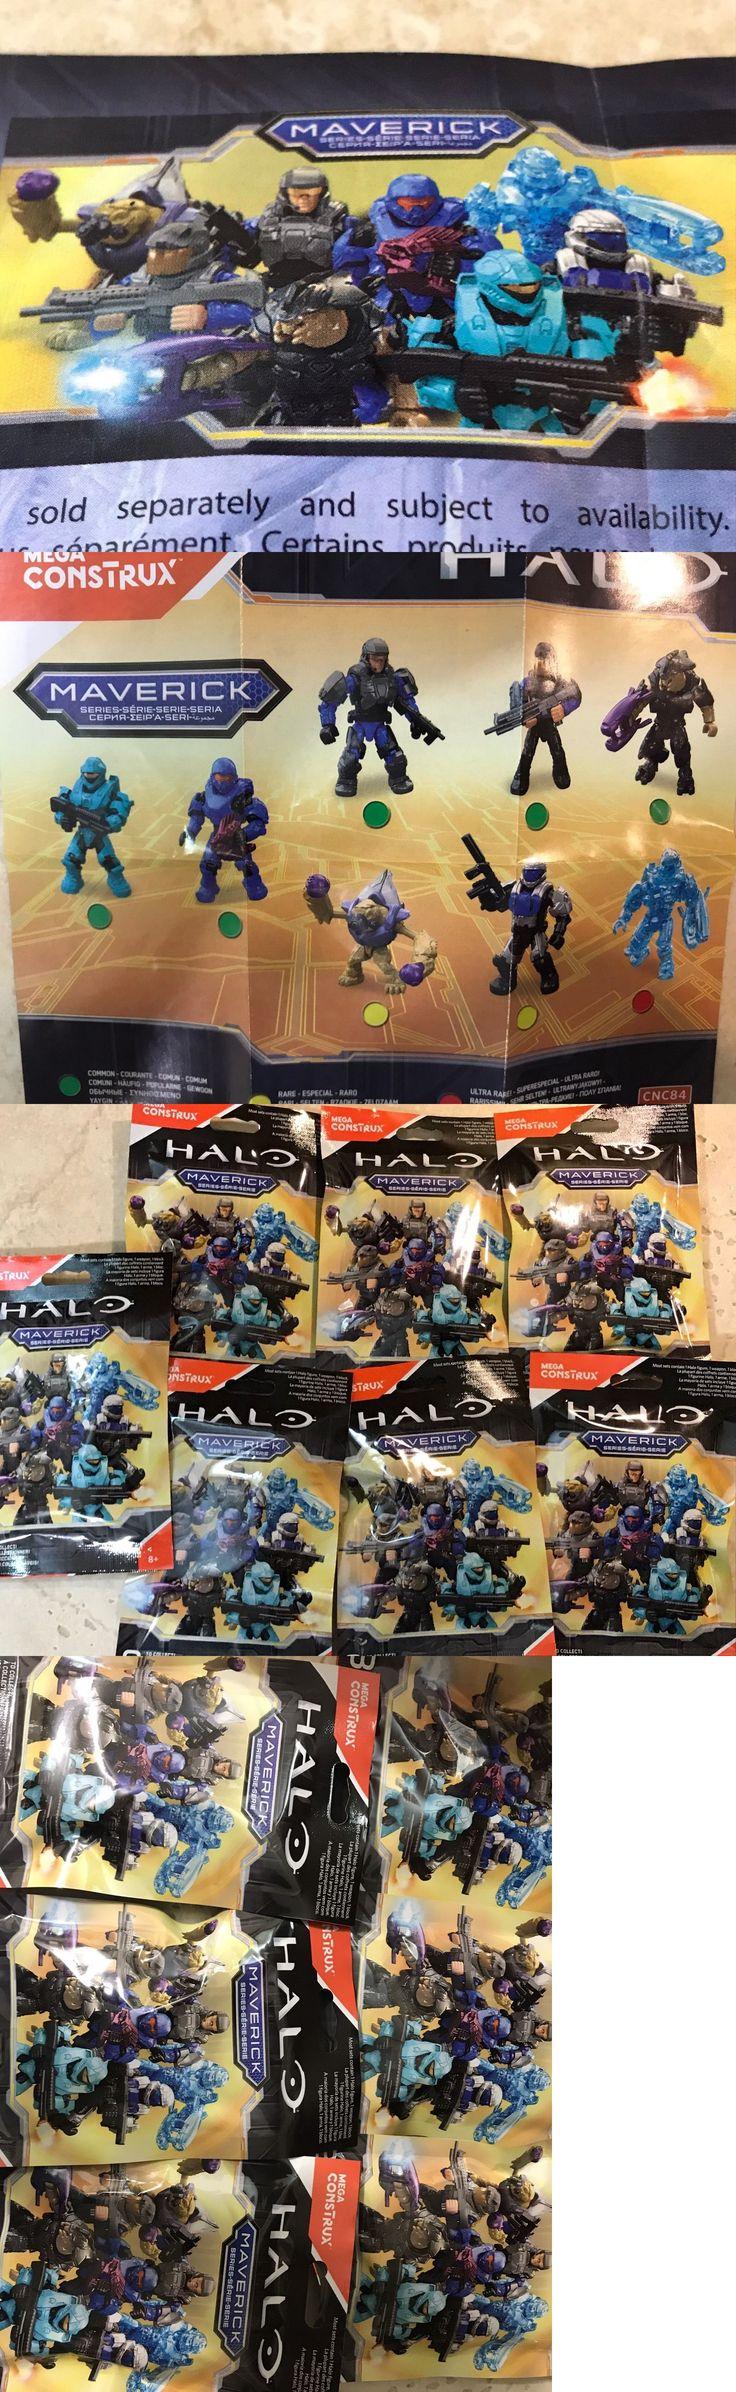 Mega Bloks 52338: All 8 Halo Mega Construx Maverick Series, Figures Sealed No Duplicates?? -> BUY IT NOW ONLY: $39.94 on eBay!